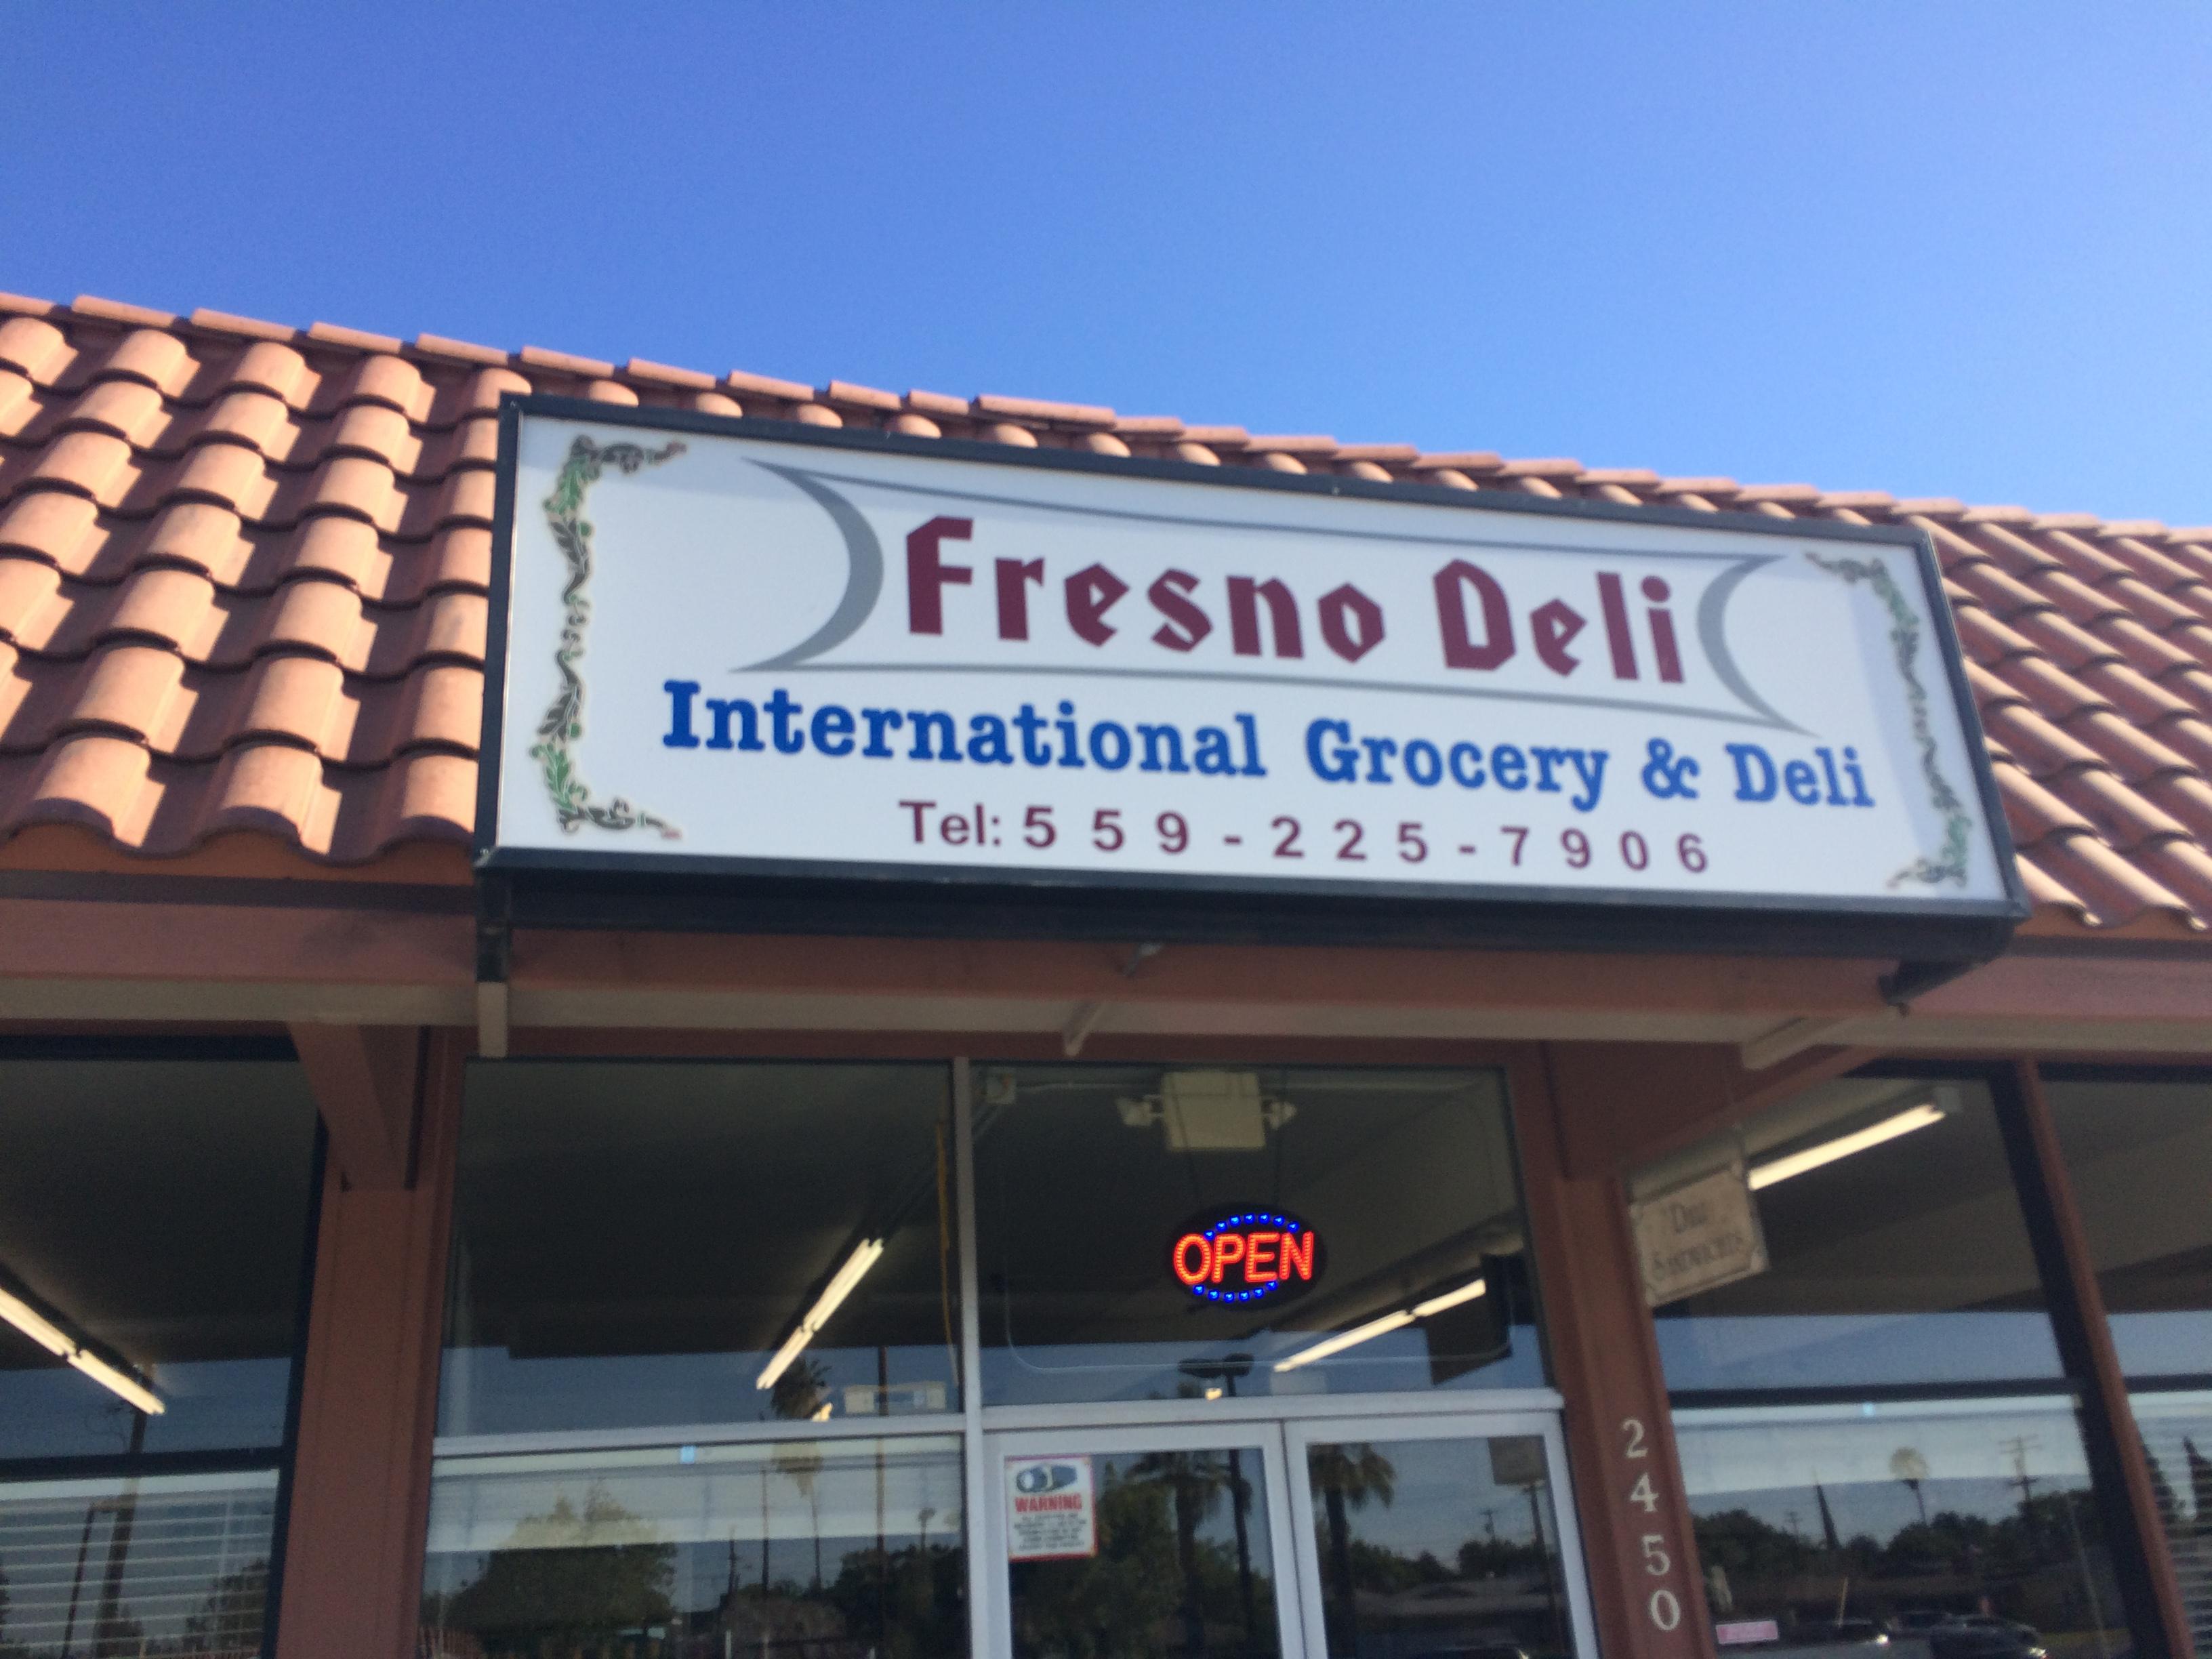 Fresno Deli